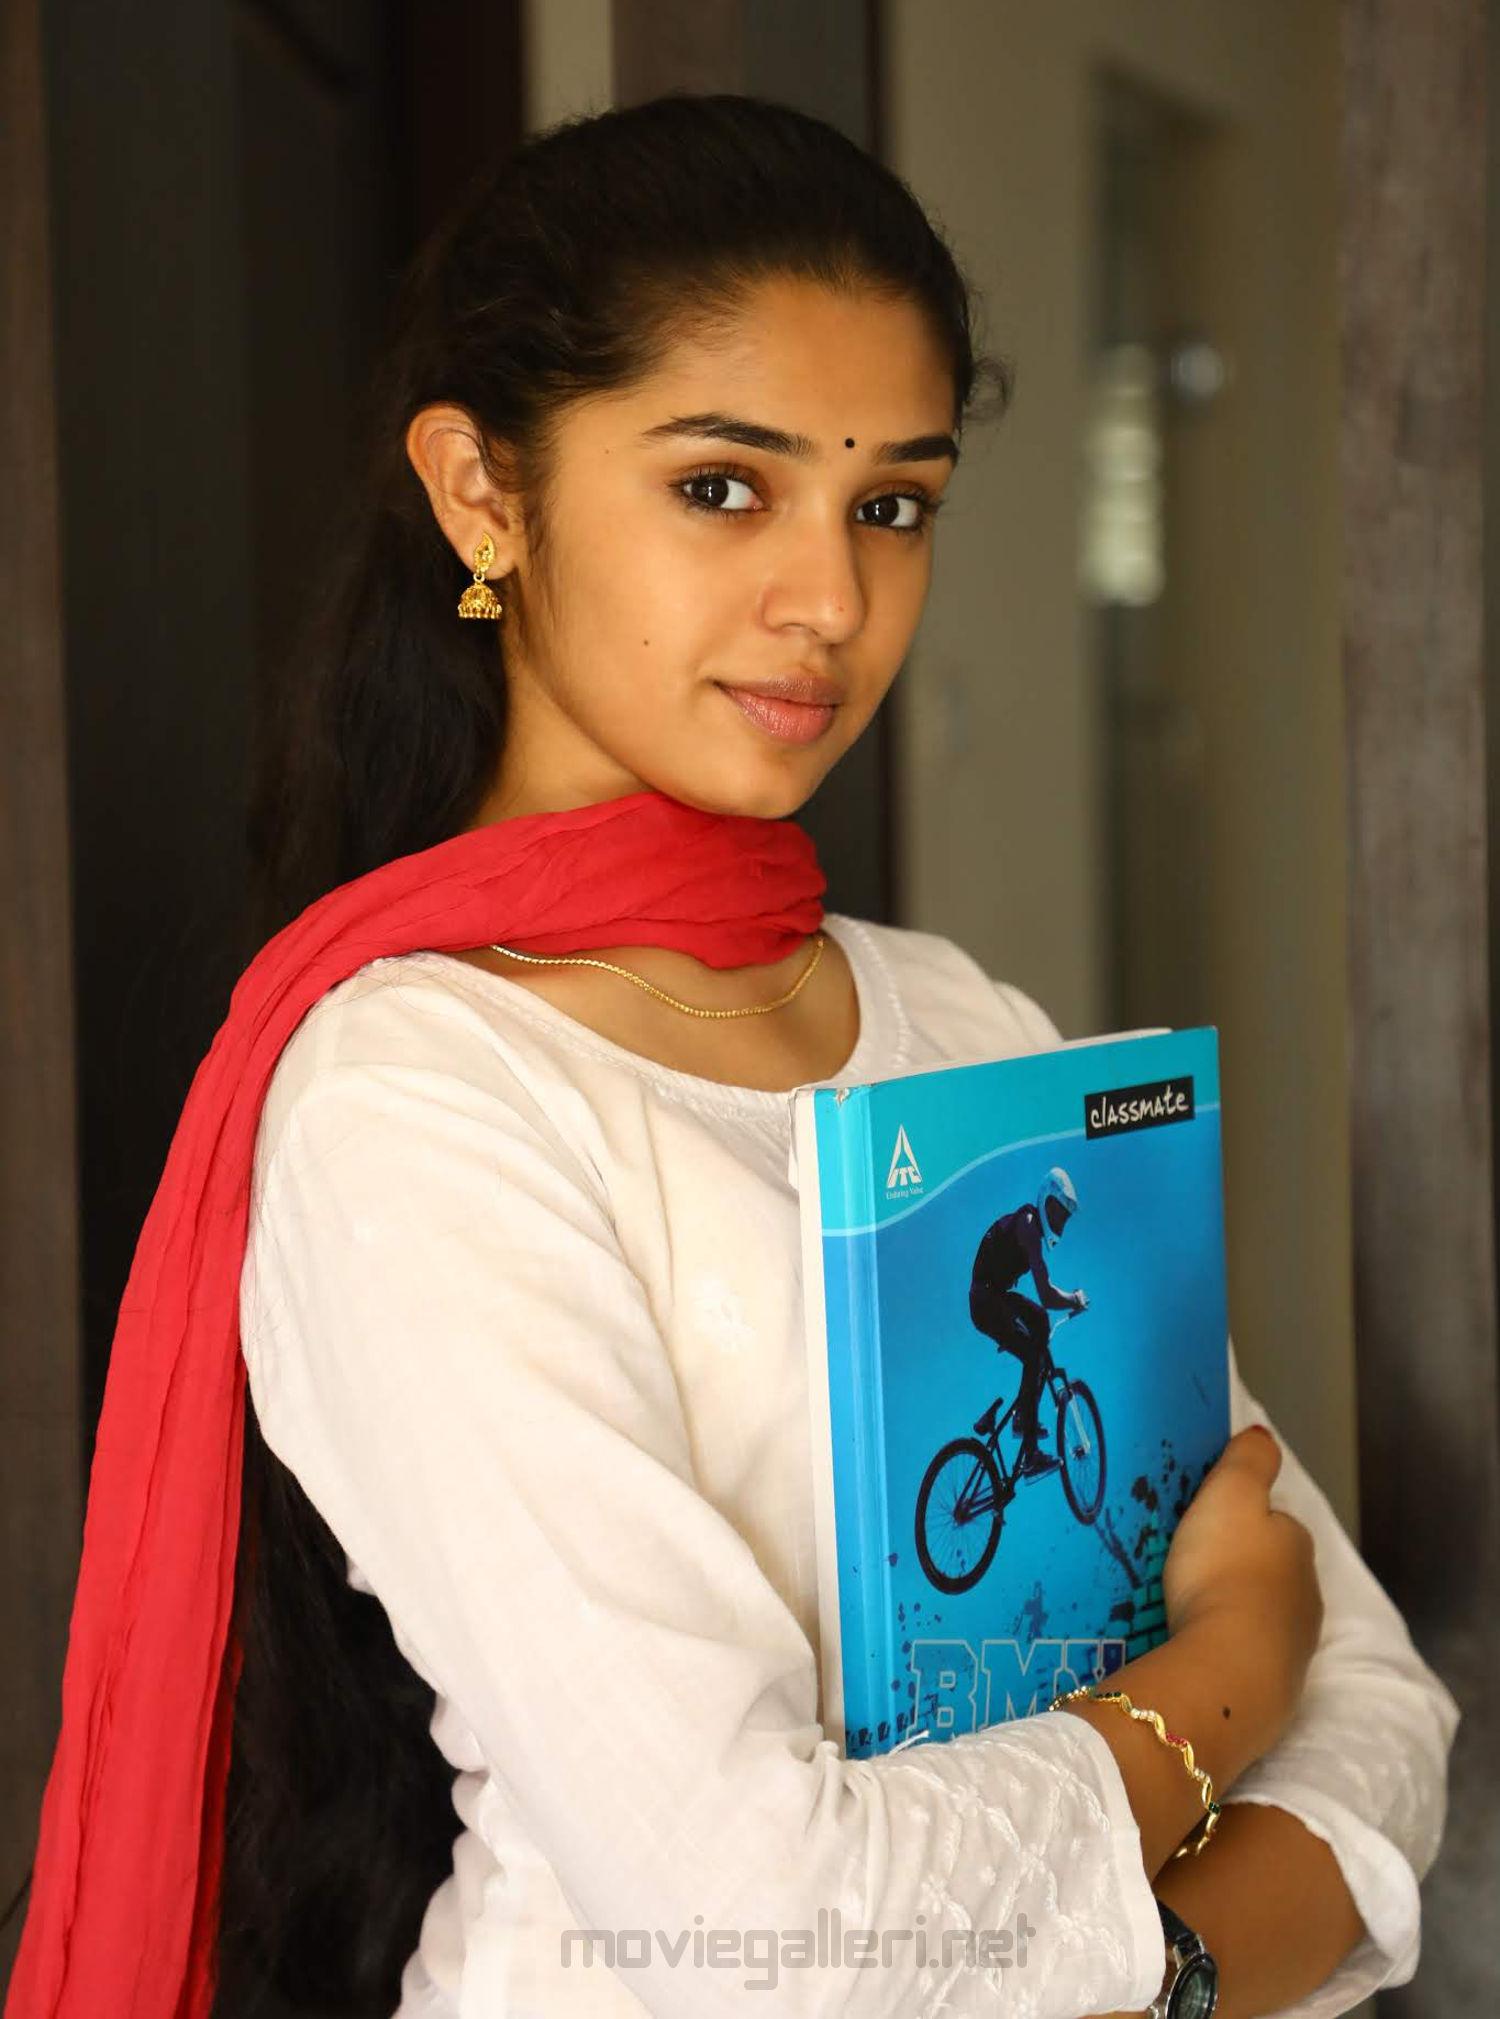 Actress Krithi Shetty in Panja Vaisshnav Tej's debut film 'Uppena'